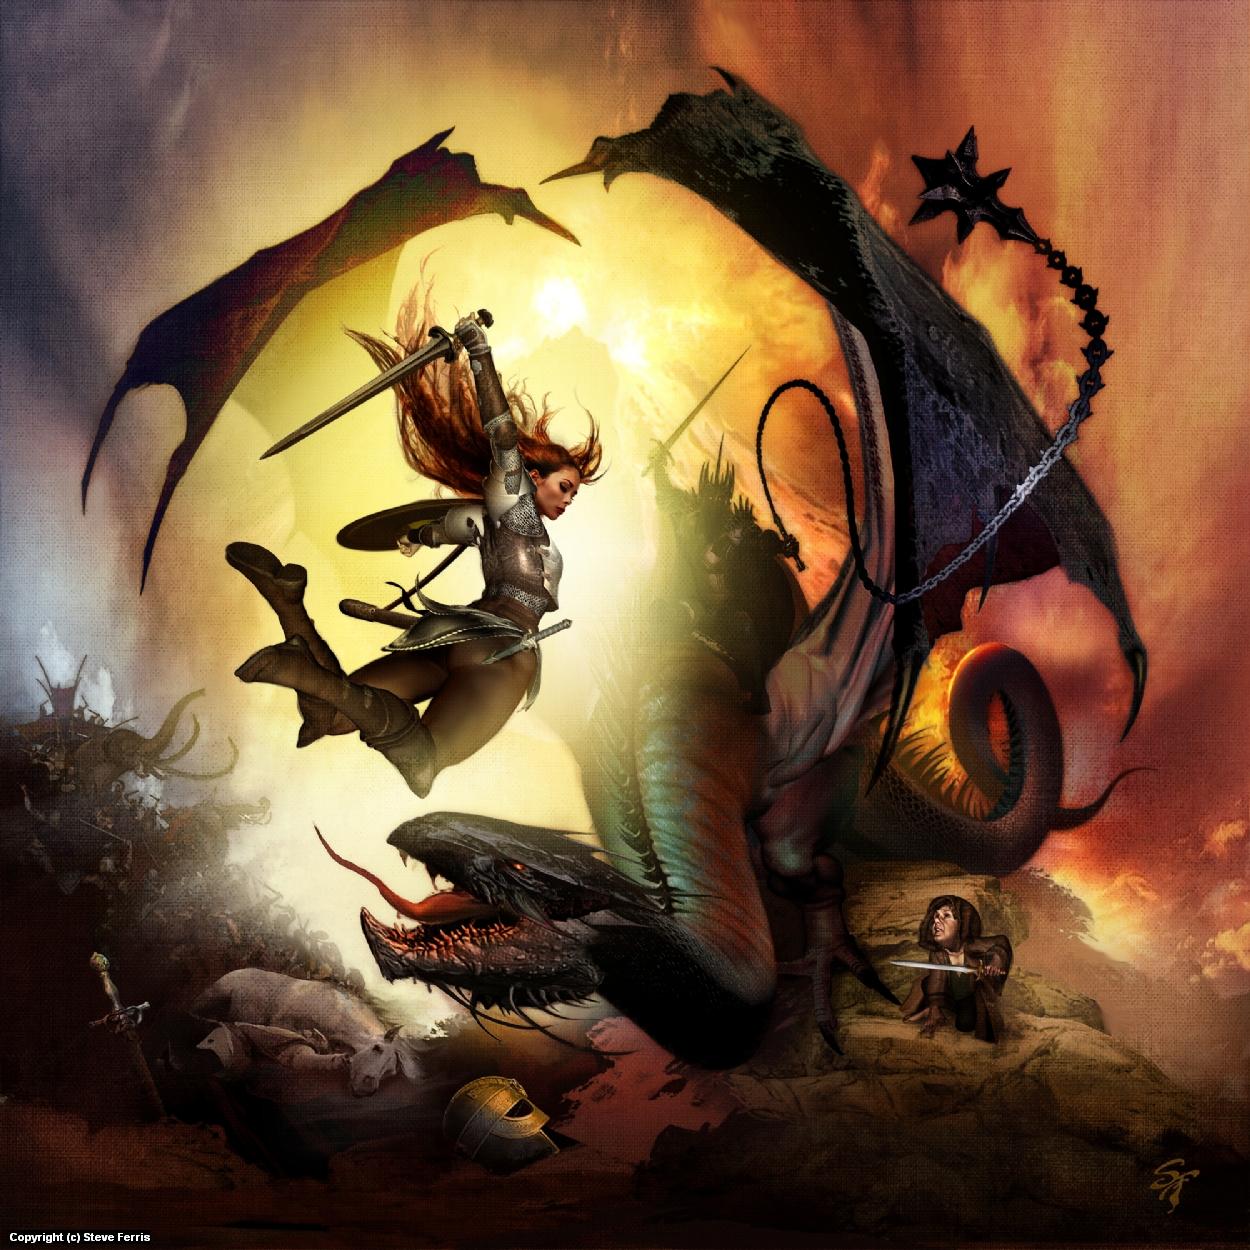 The Geeky Nerfherder Artoftheday Eowyn Vs Witchking By Legend Of Five Rings Tears Amaterasu Exp Steve Ferris